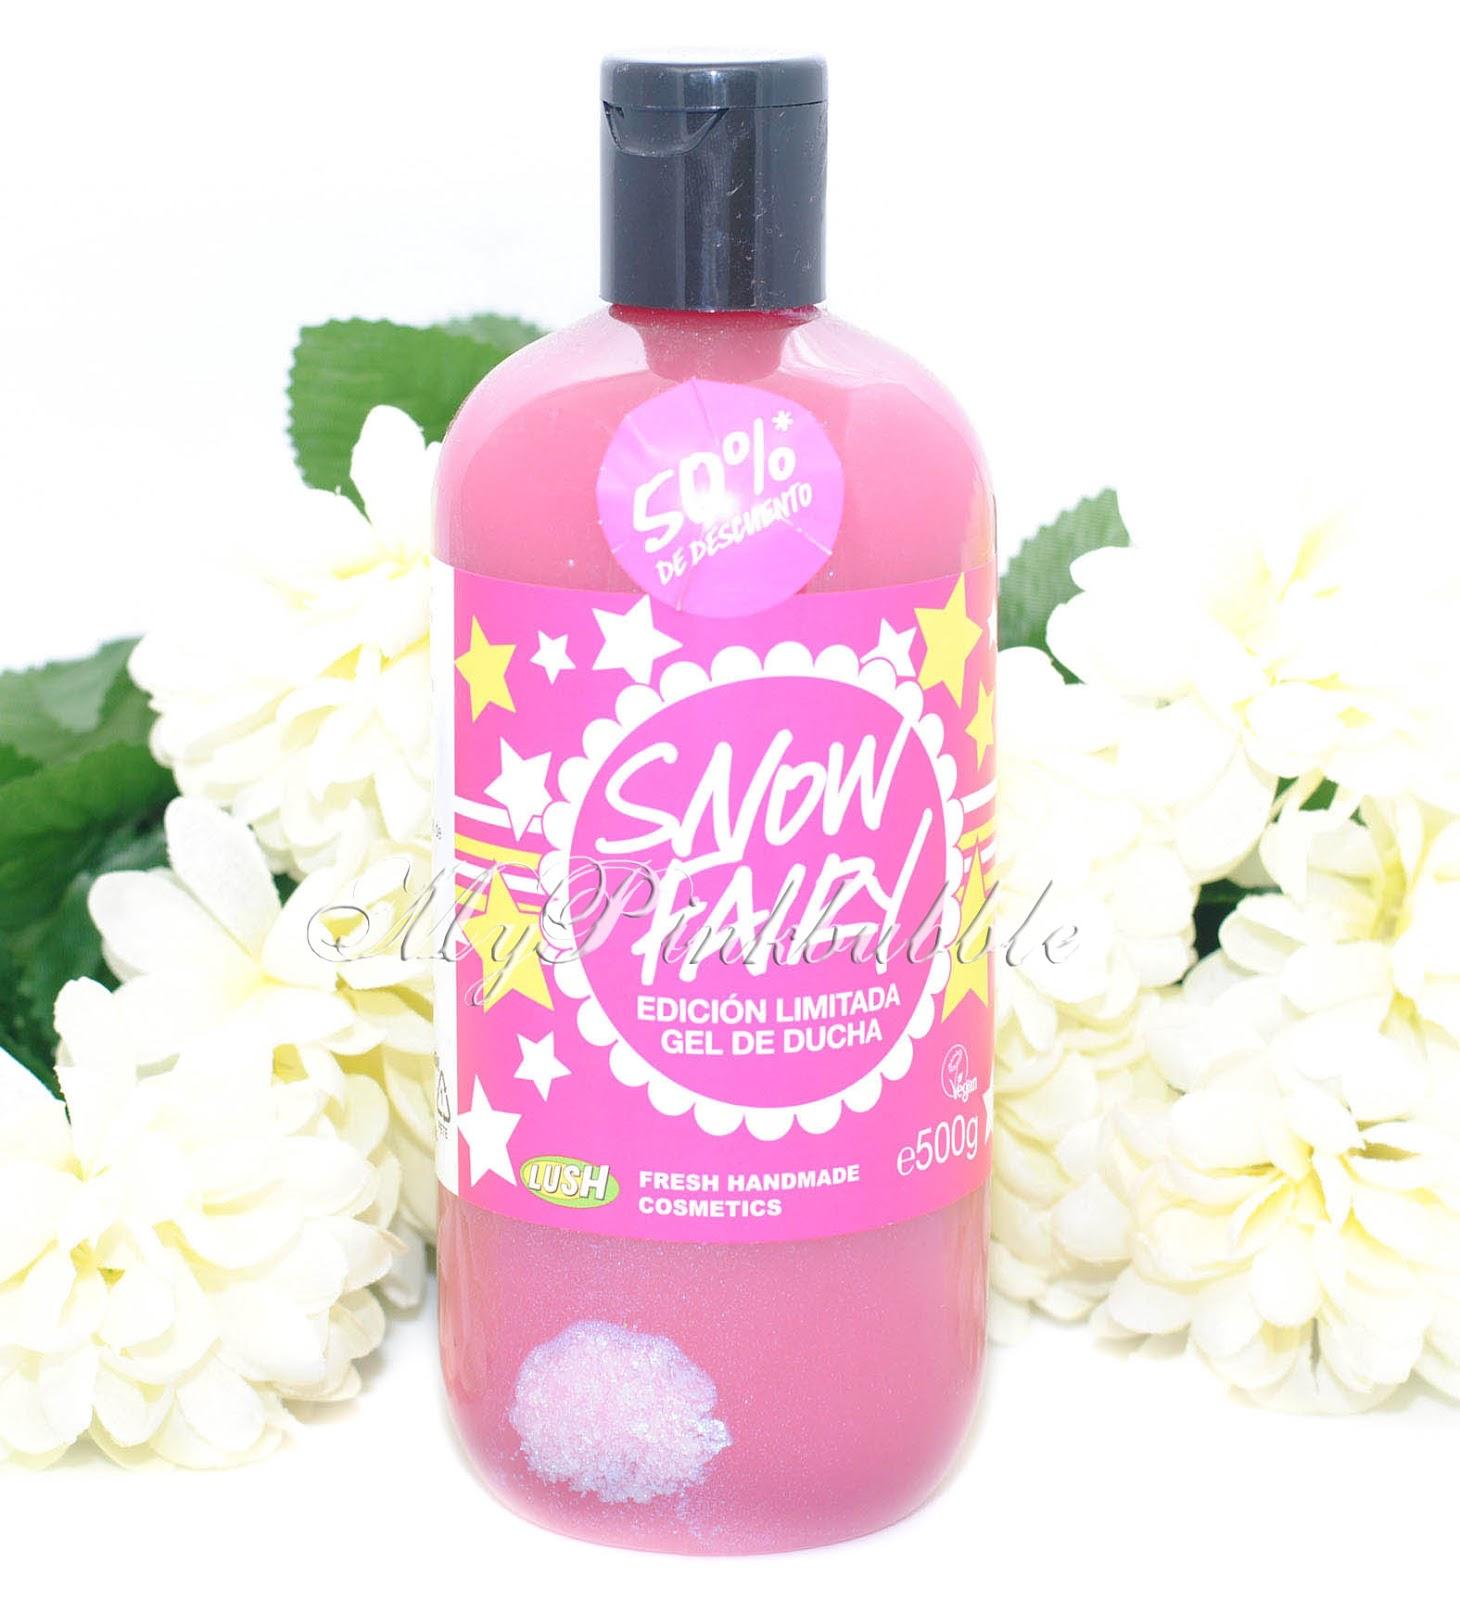 Snow fairy lush